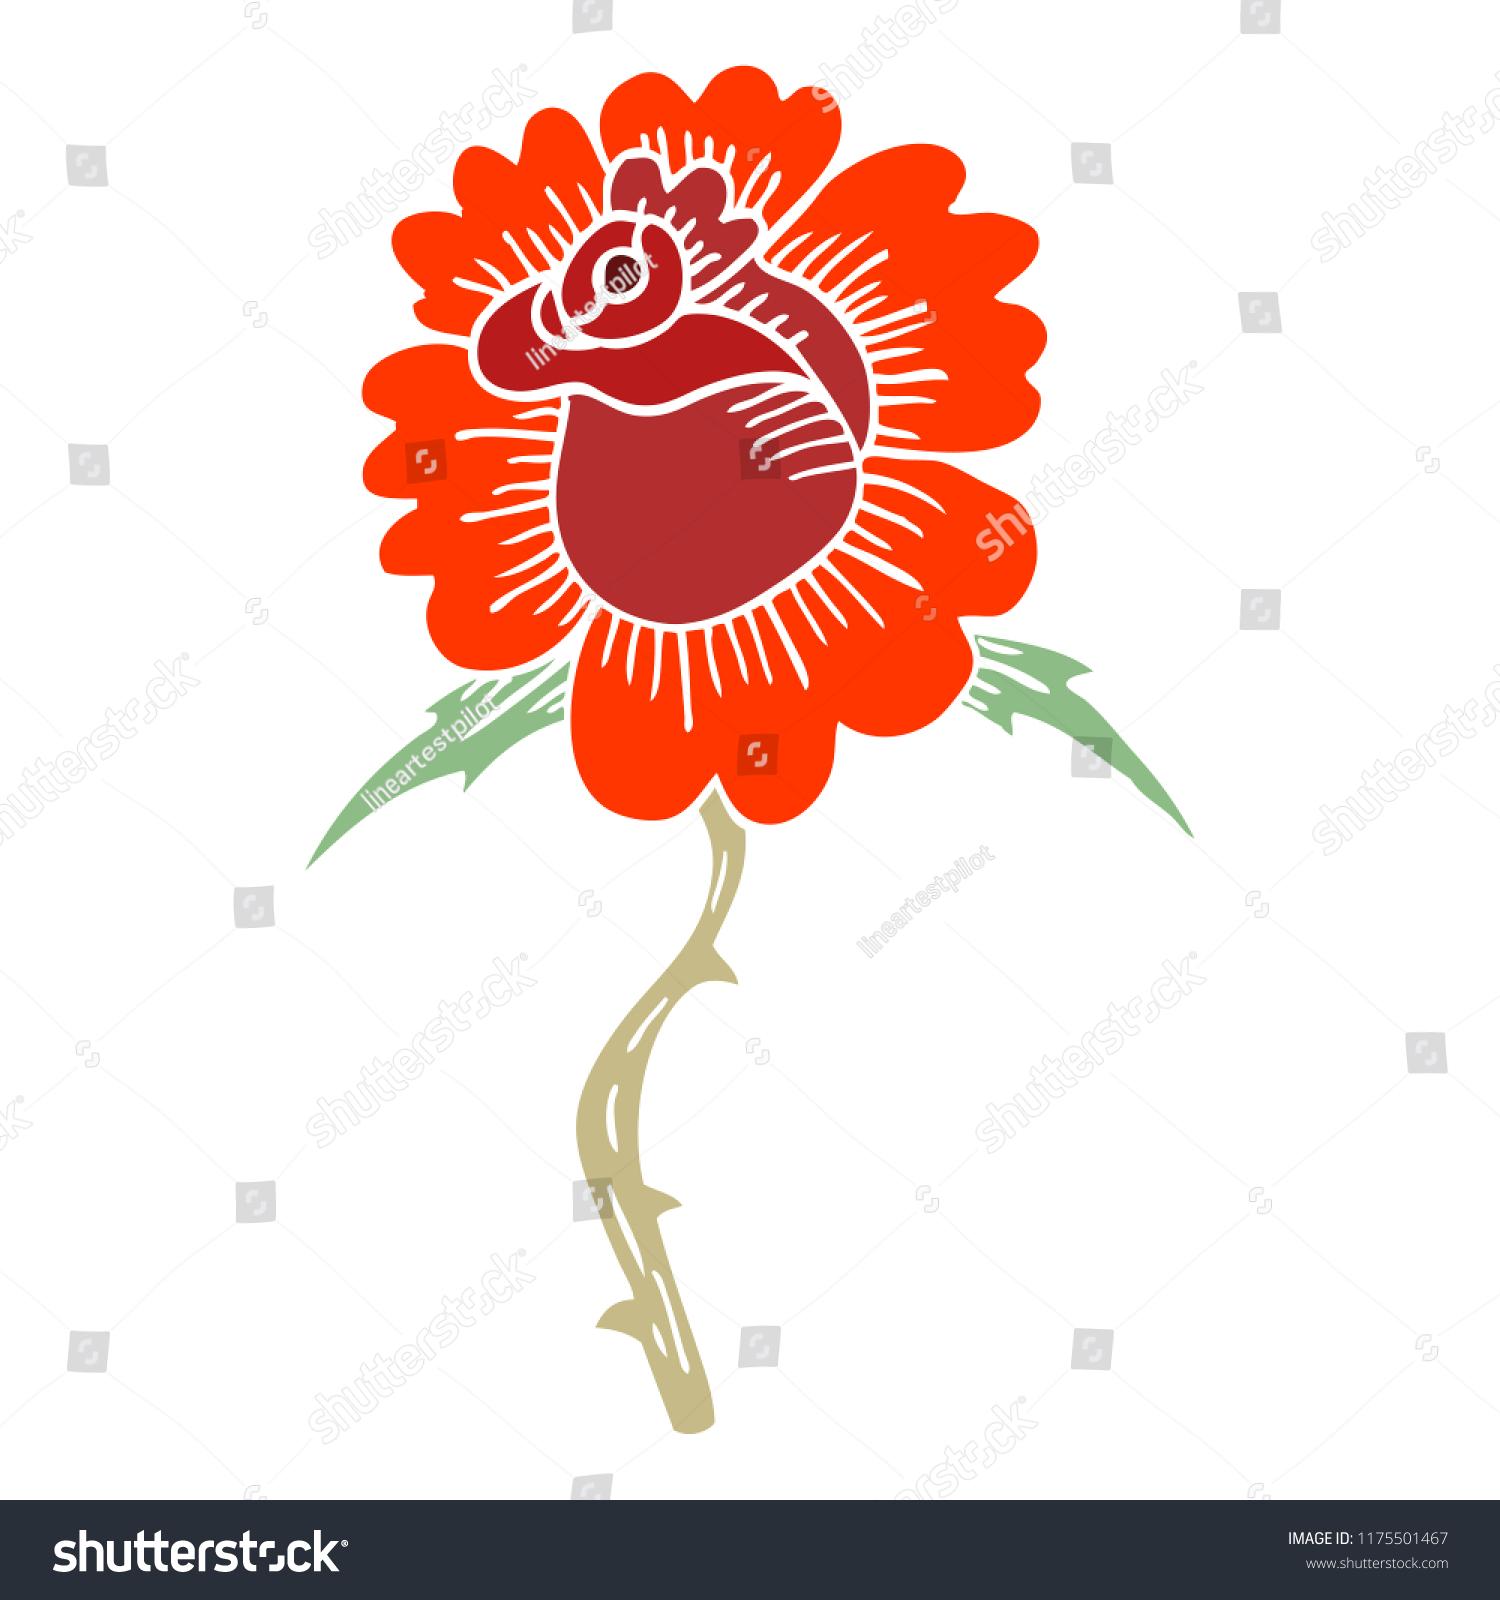 09a0233b9 Cartoon Doodle Rose Tattoo Symbol Stock Vector (Royalty Free) 1175501467